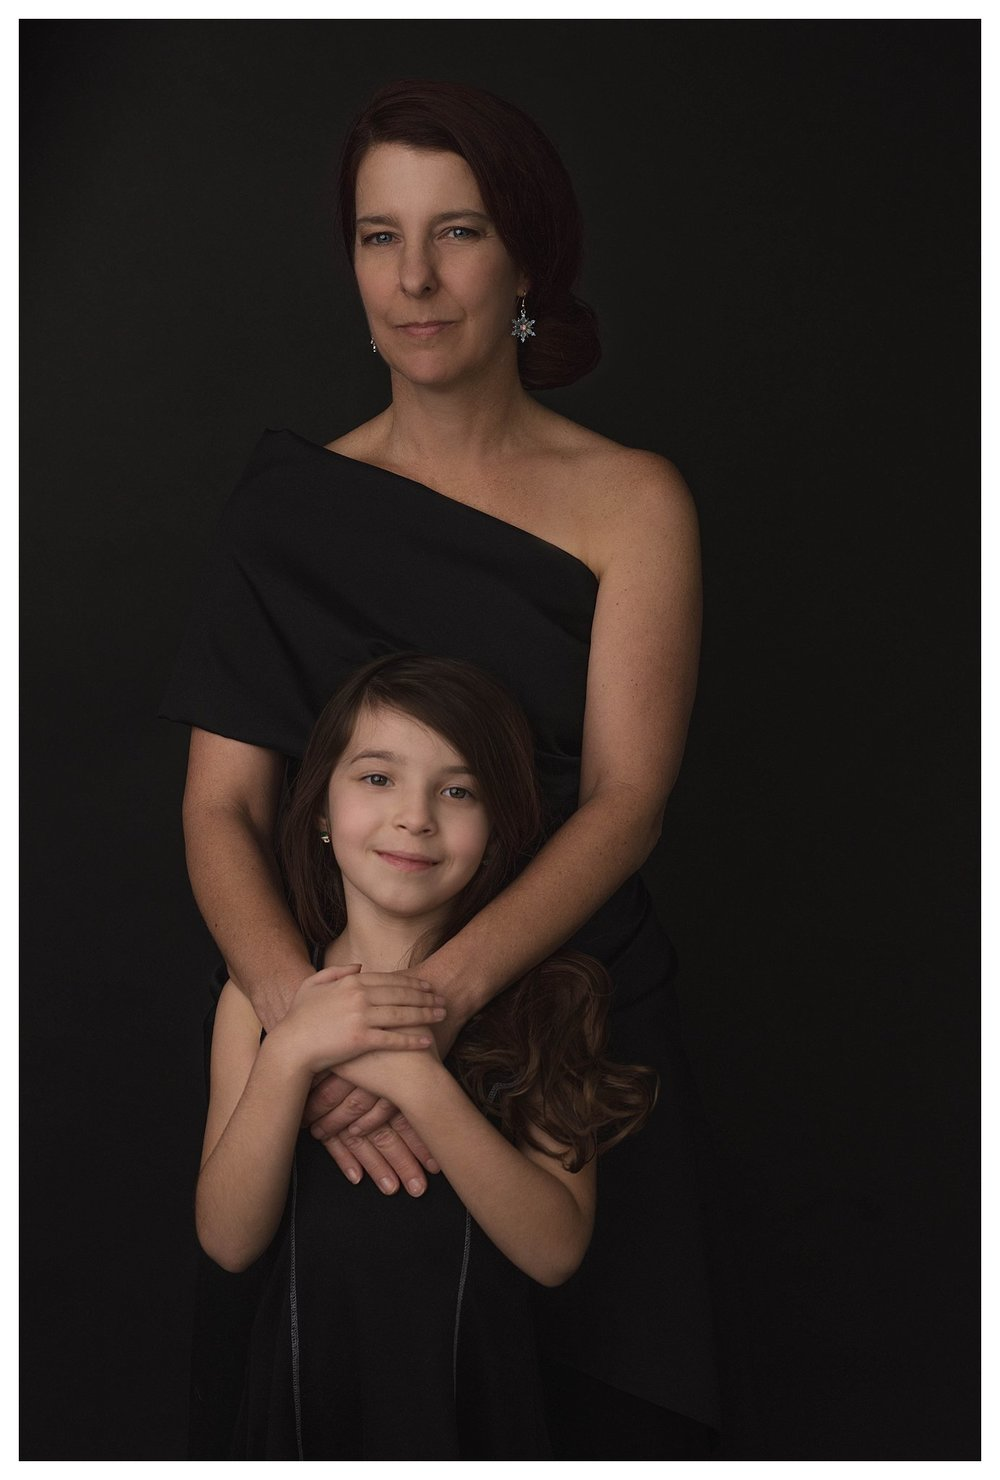 mother-and-daughter-pictures-studio-portraits-san-antonio-texas-photographer-families.jpg